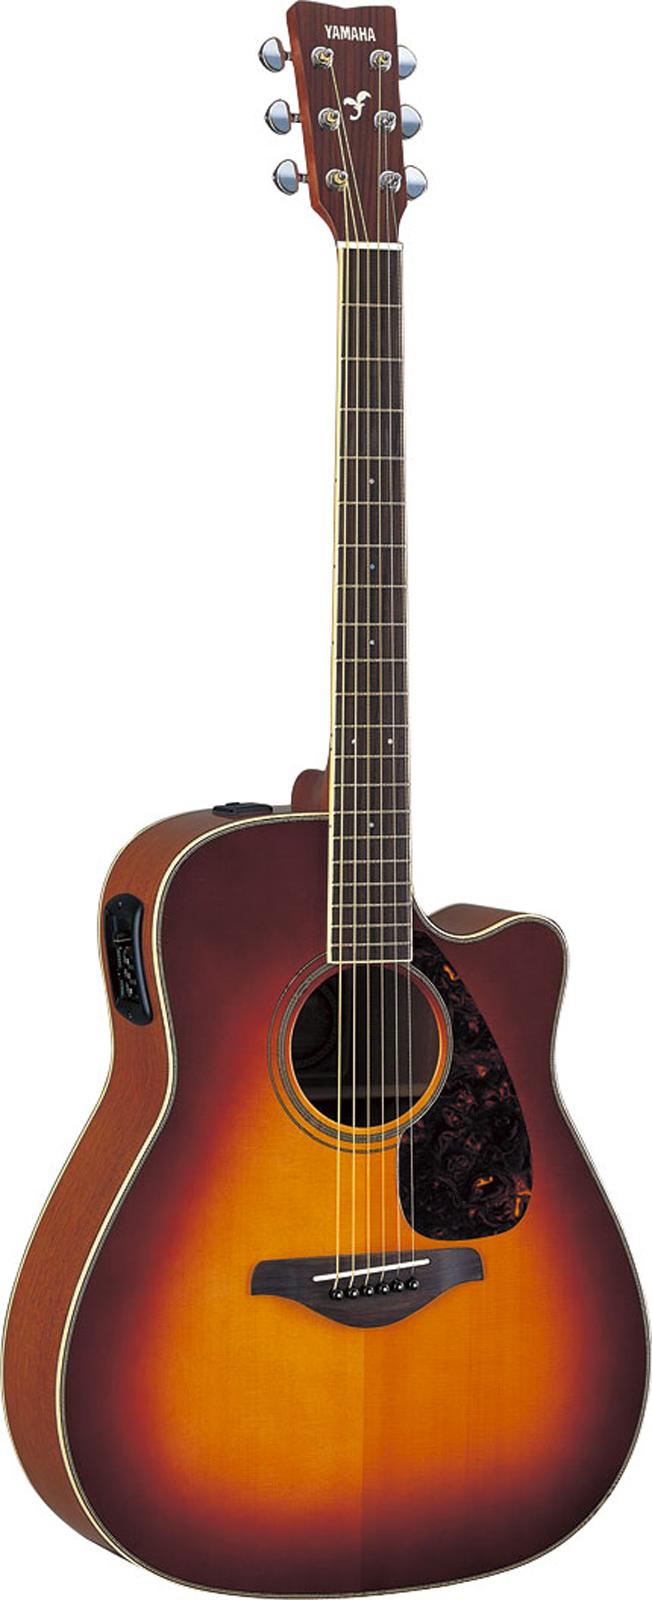 Yamaha Fgx720sciibs Brown Sunburst